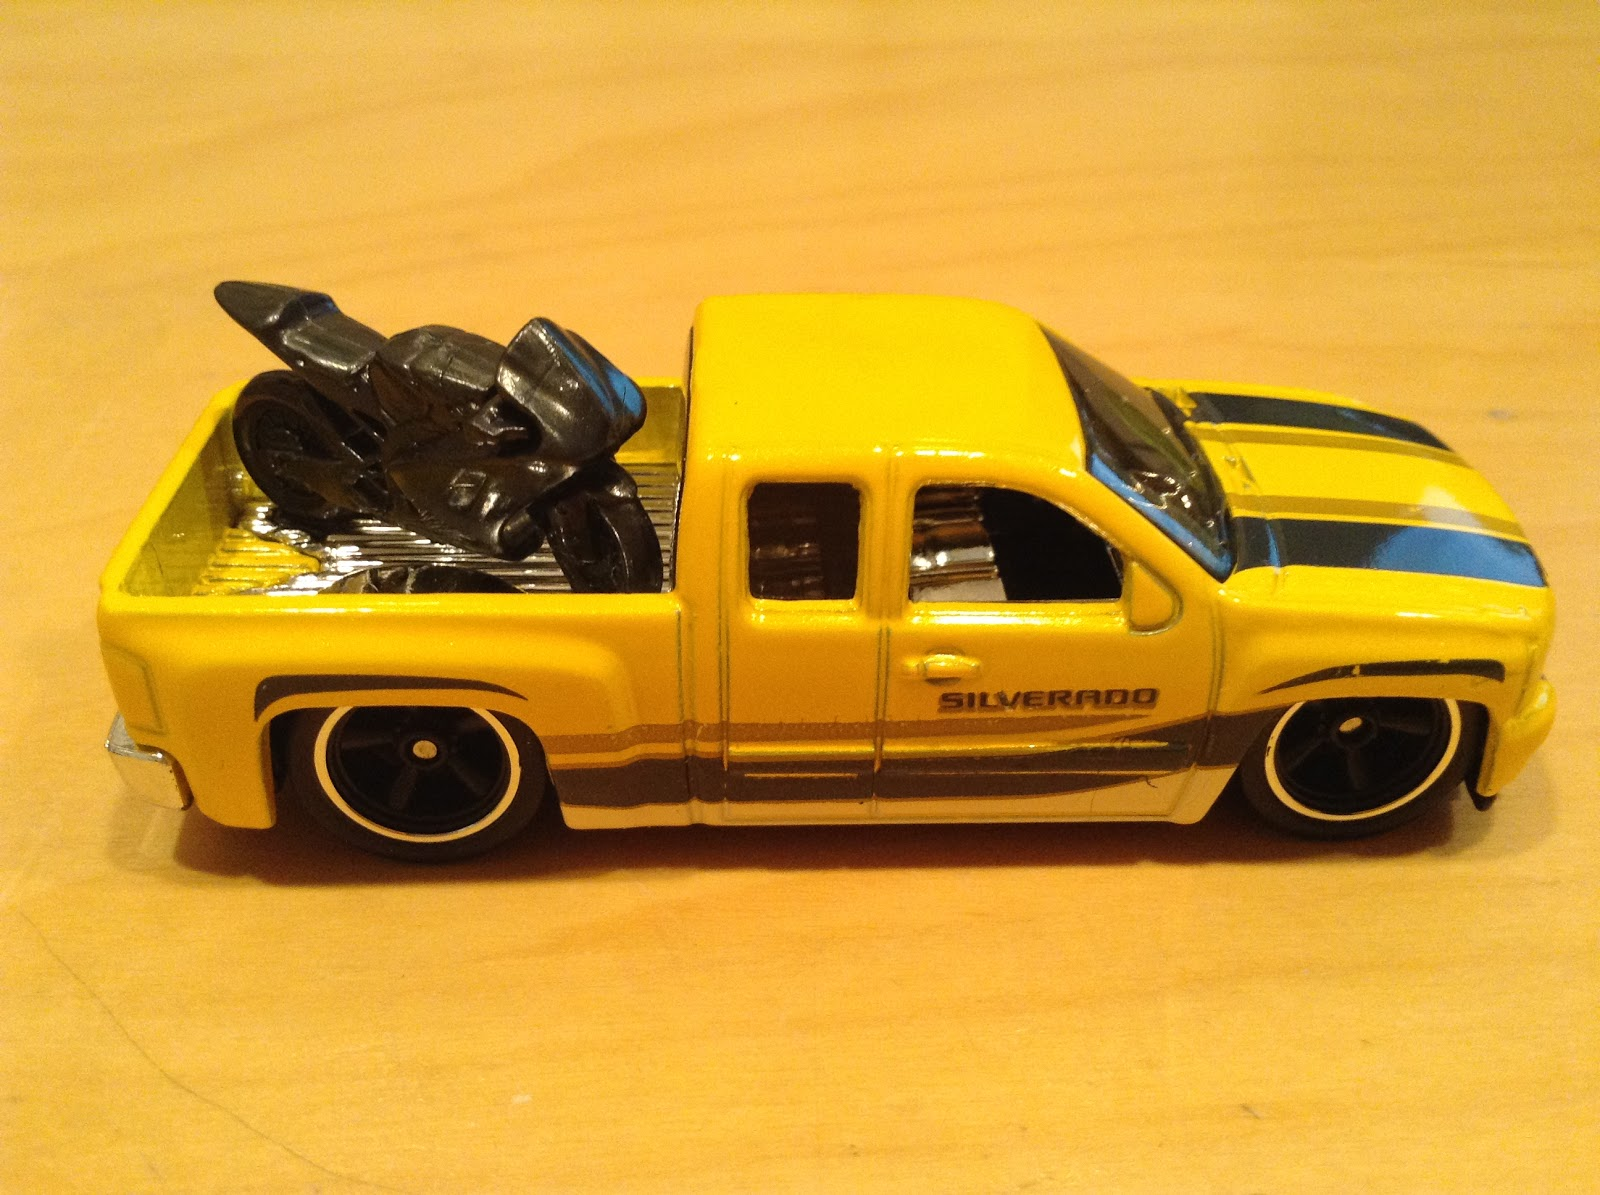 julian 39 s hot wheels blog chevy silverado 2016 car. Black Bedroom Furniture Sets. Home Design Ideas